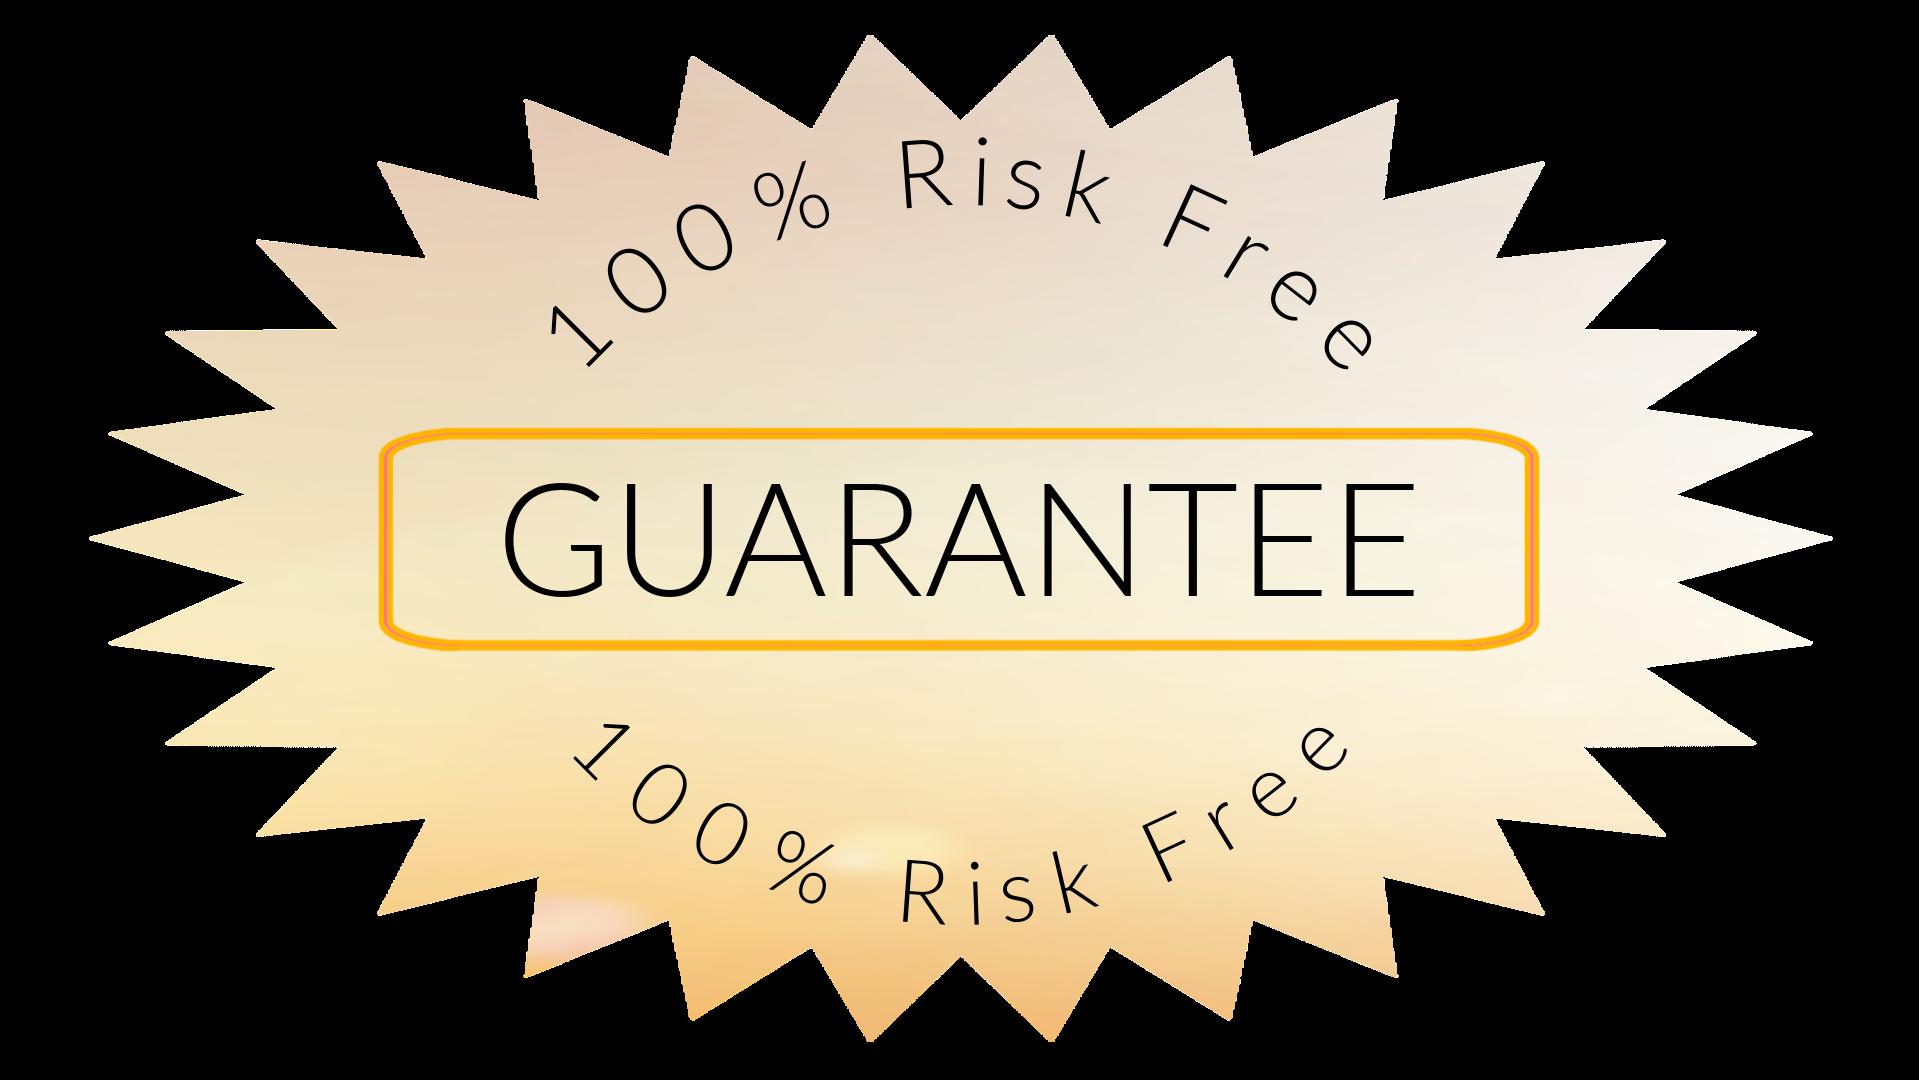 risk-free-guarantee-the-art-of-tuning-in-maria-furlano